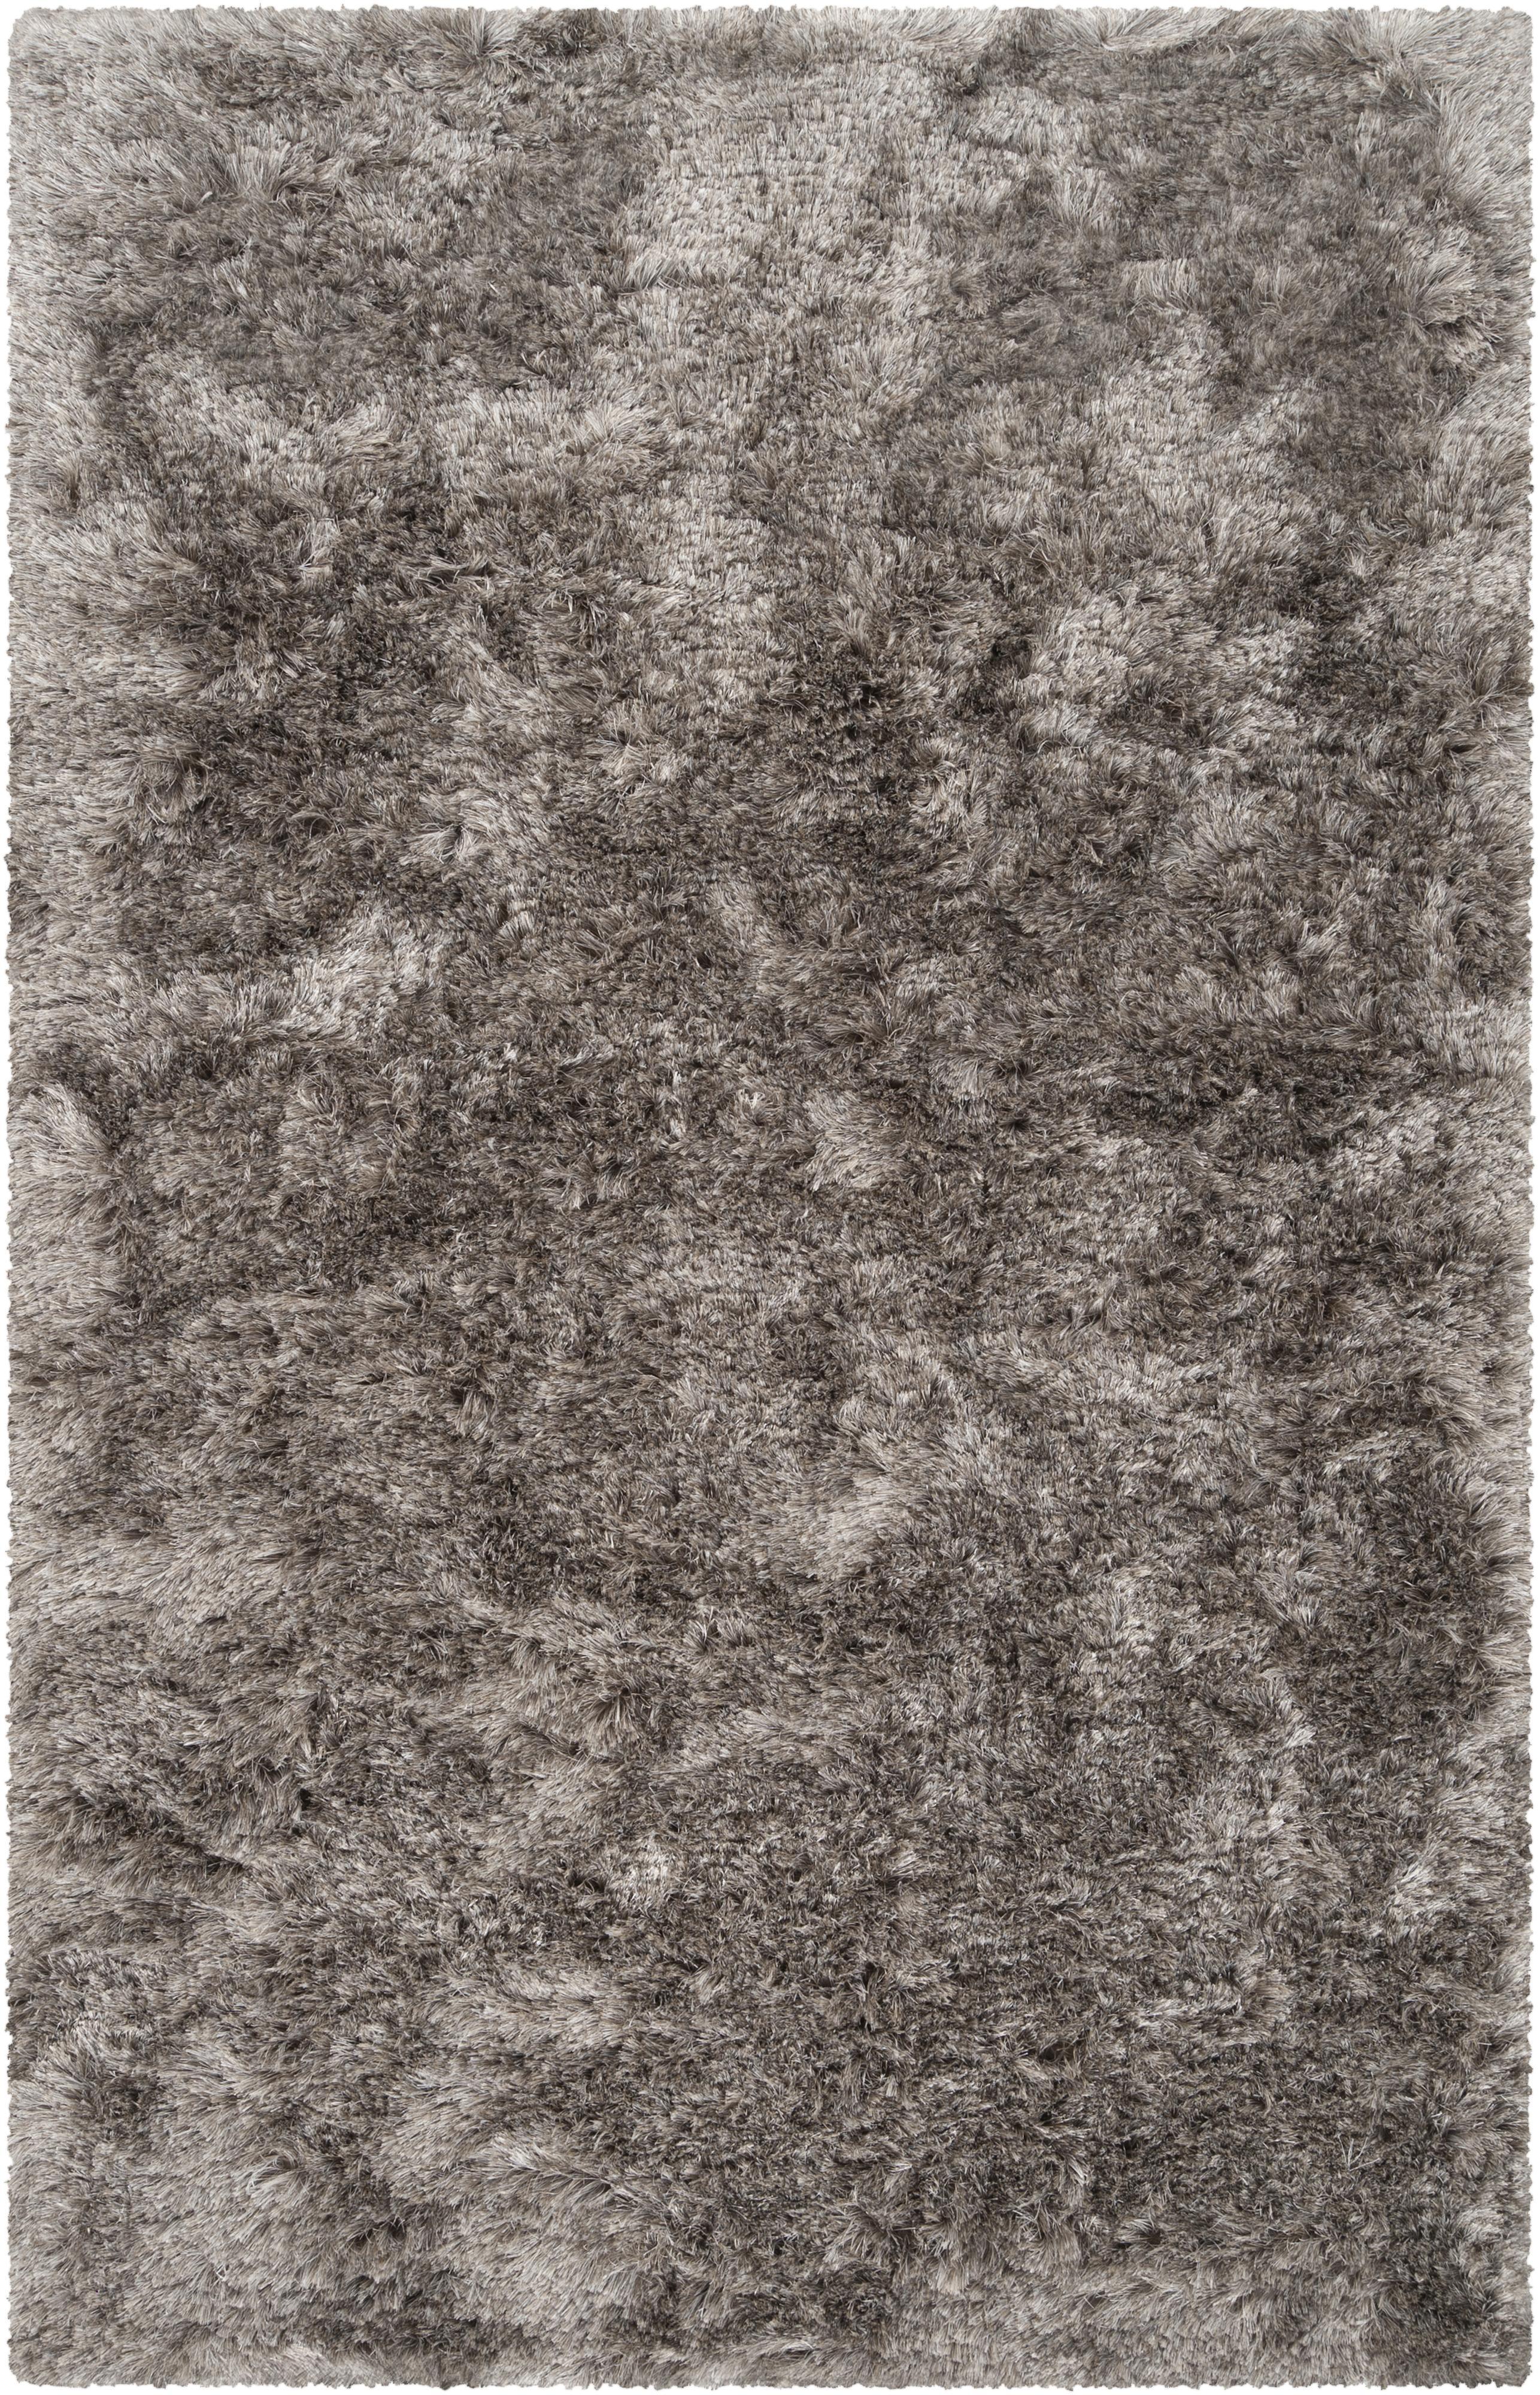 Surya Rugs Dunes 5' x 8' - Item Number: DNE3501-58